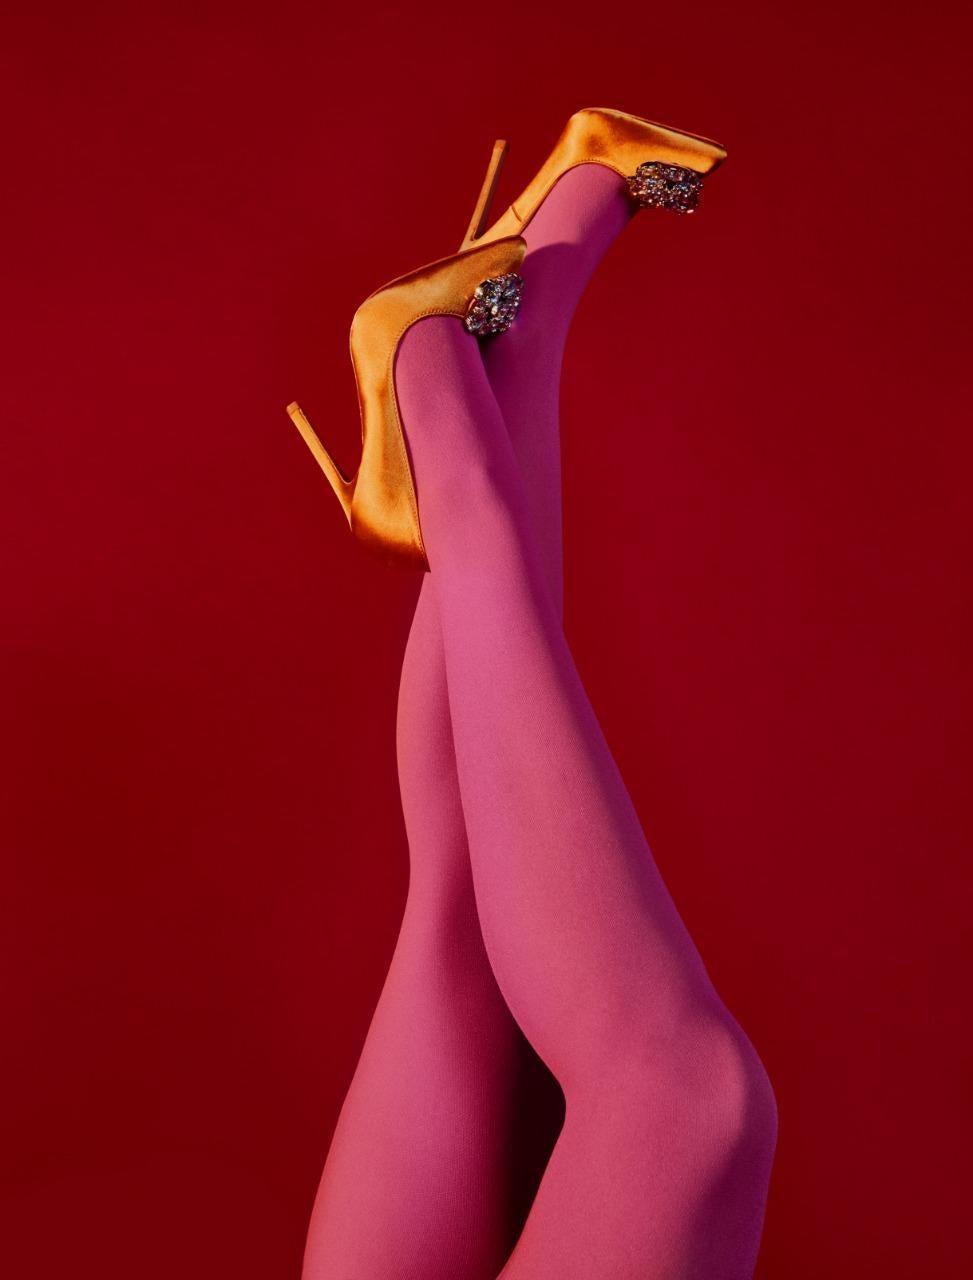 Pink Legs I